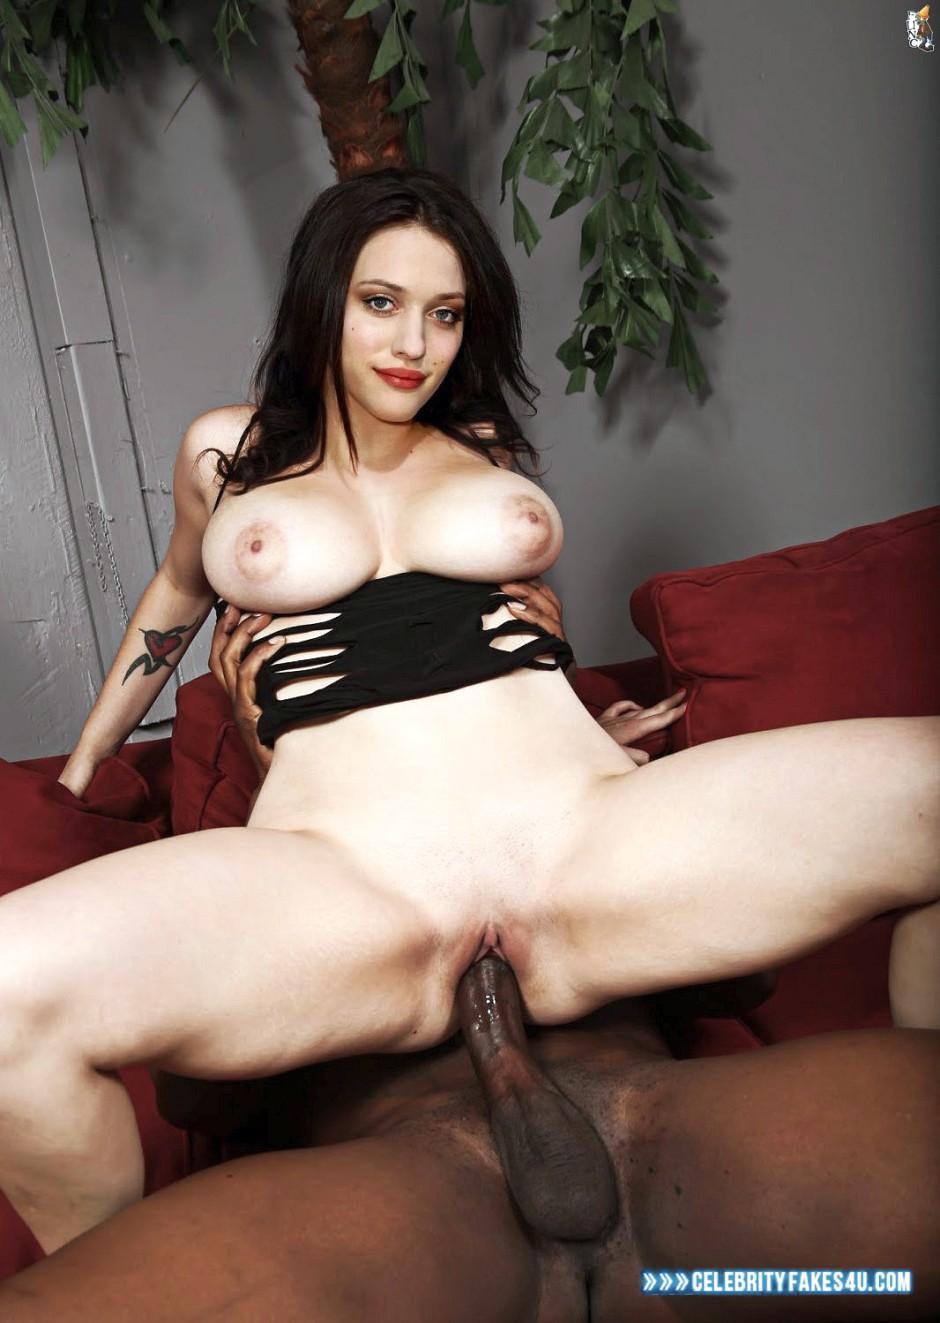 kat tattoos nude